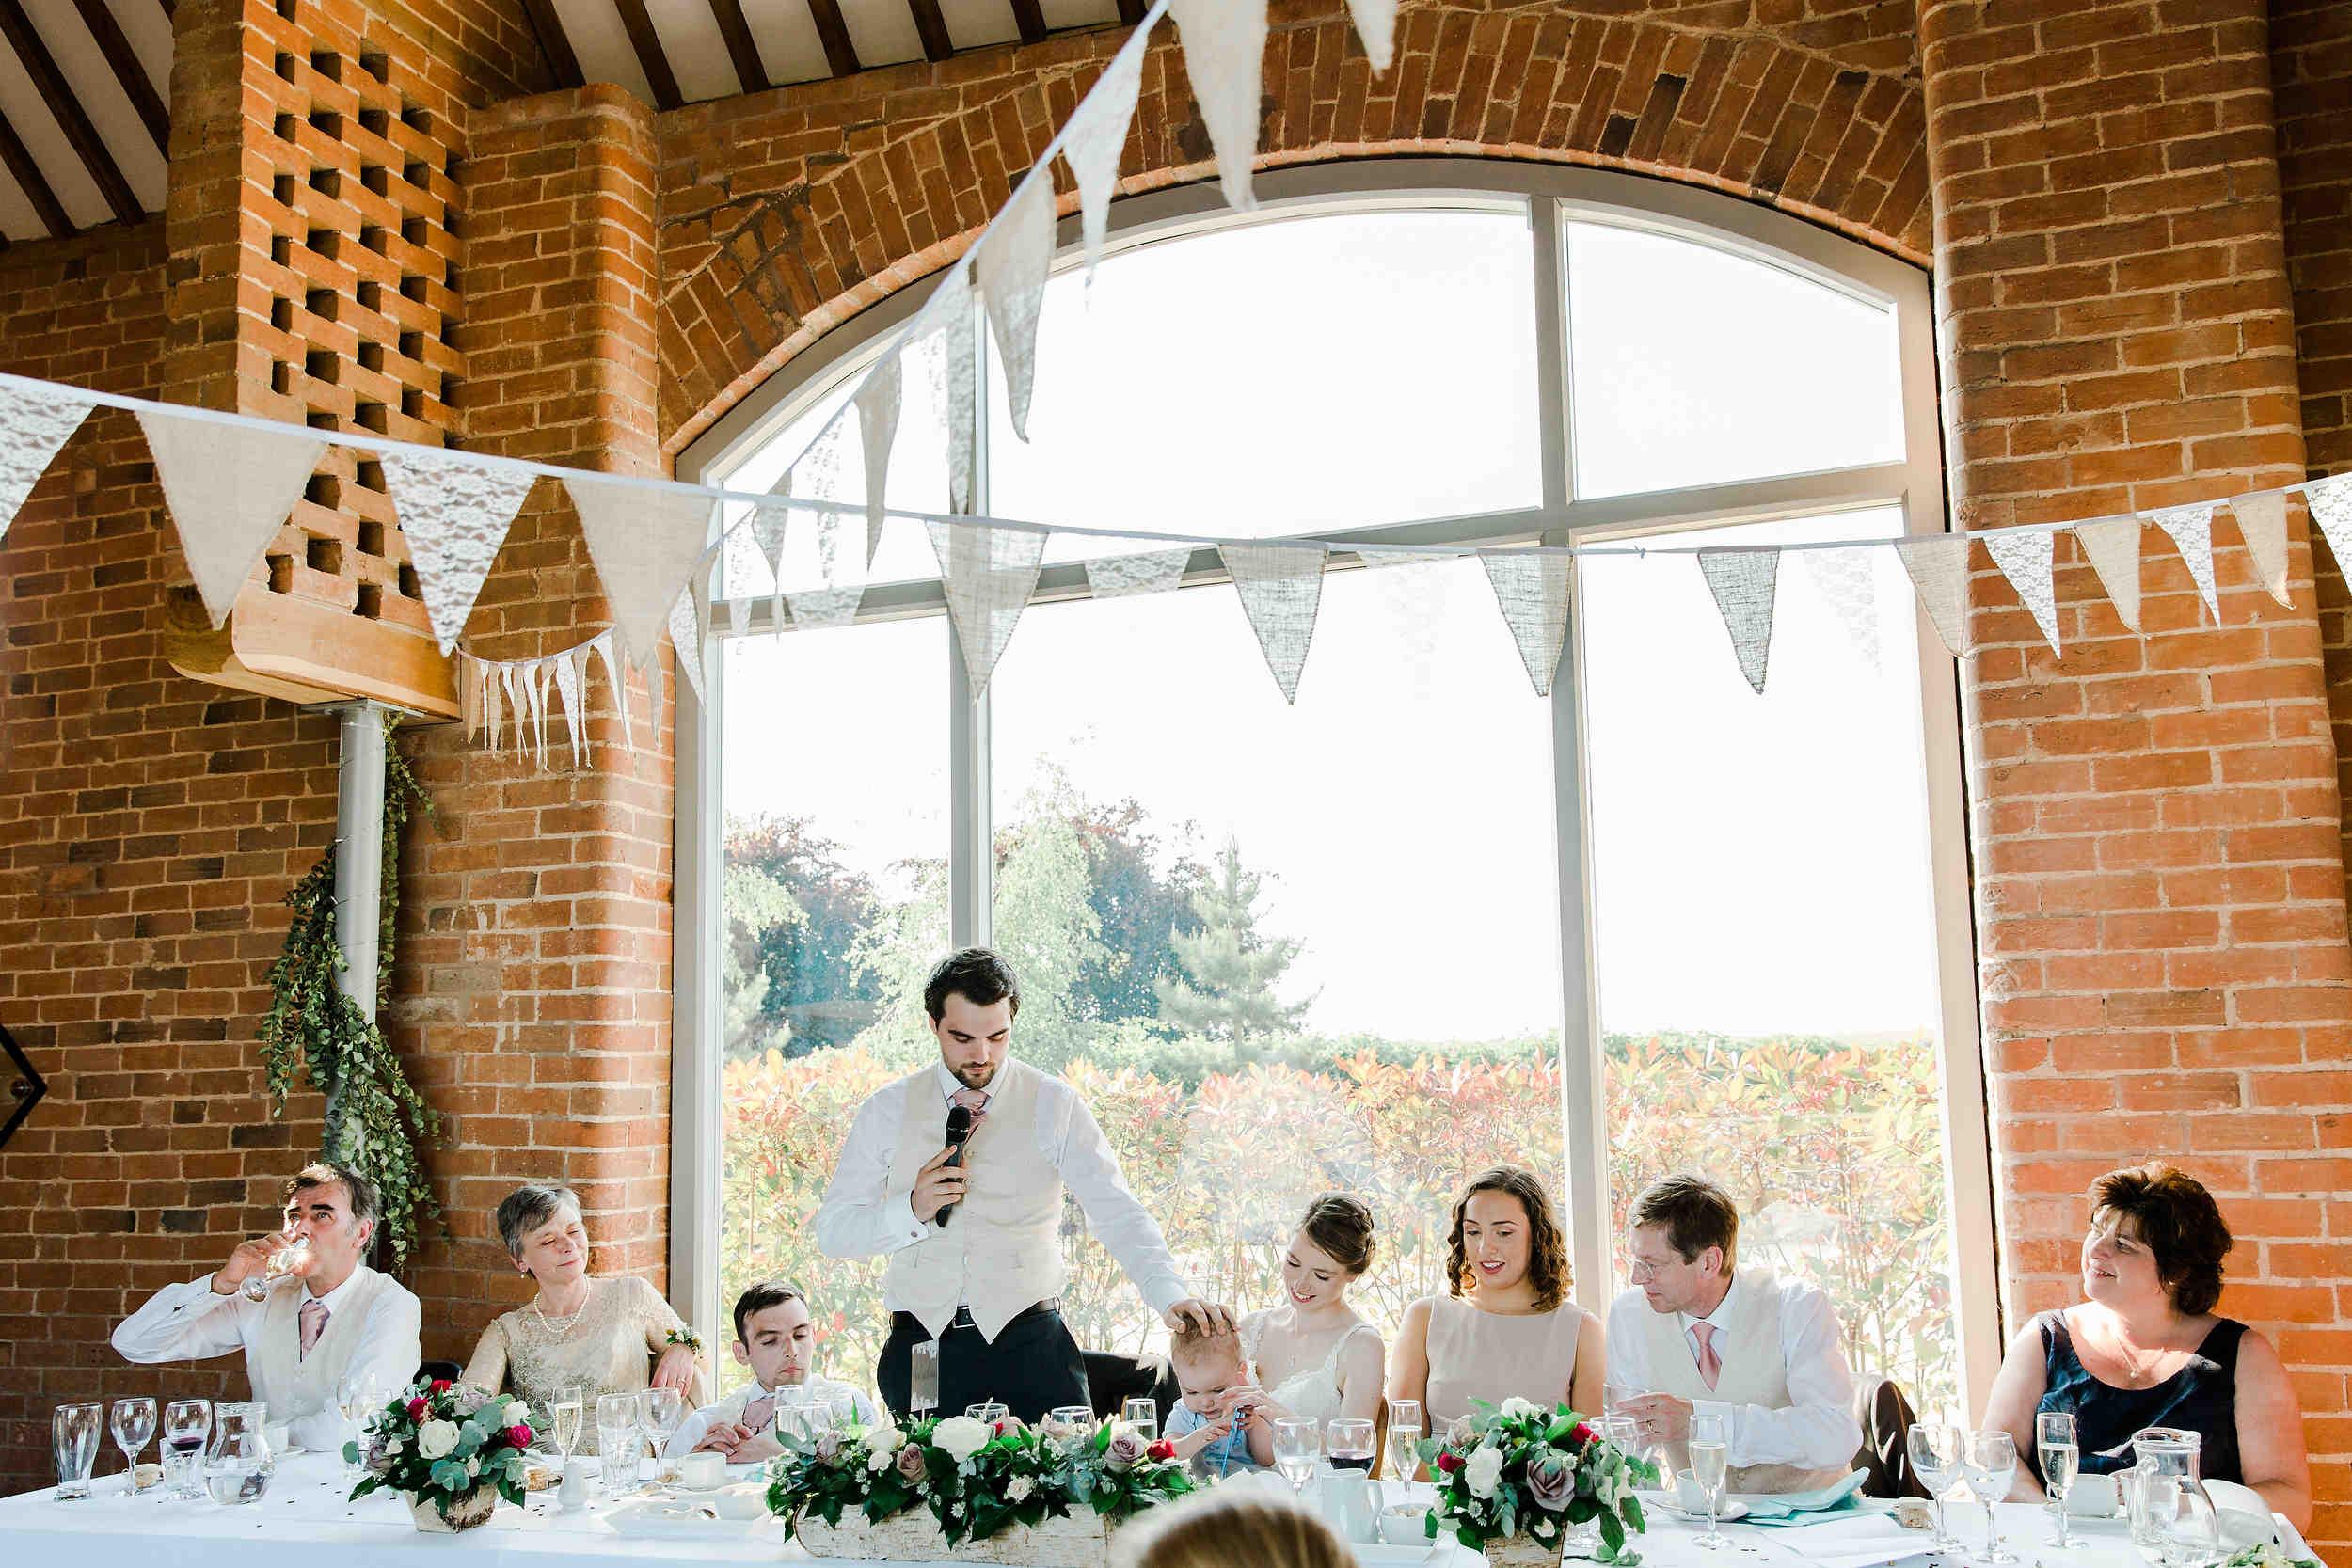 Modern_Stylish_Wedding_at_Swallows_Nest_Barn1251